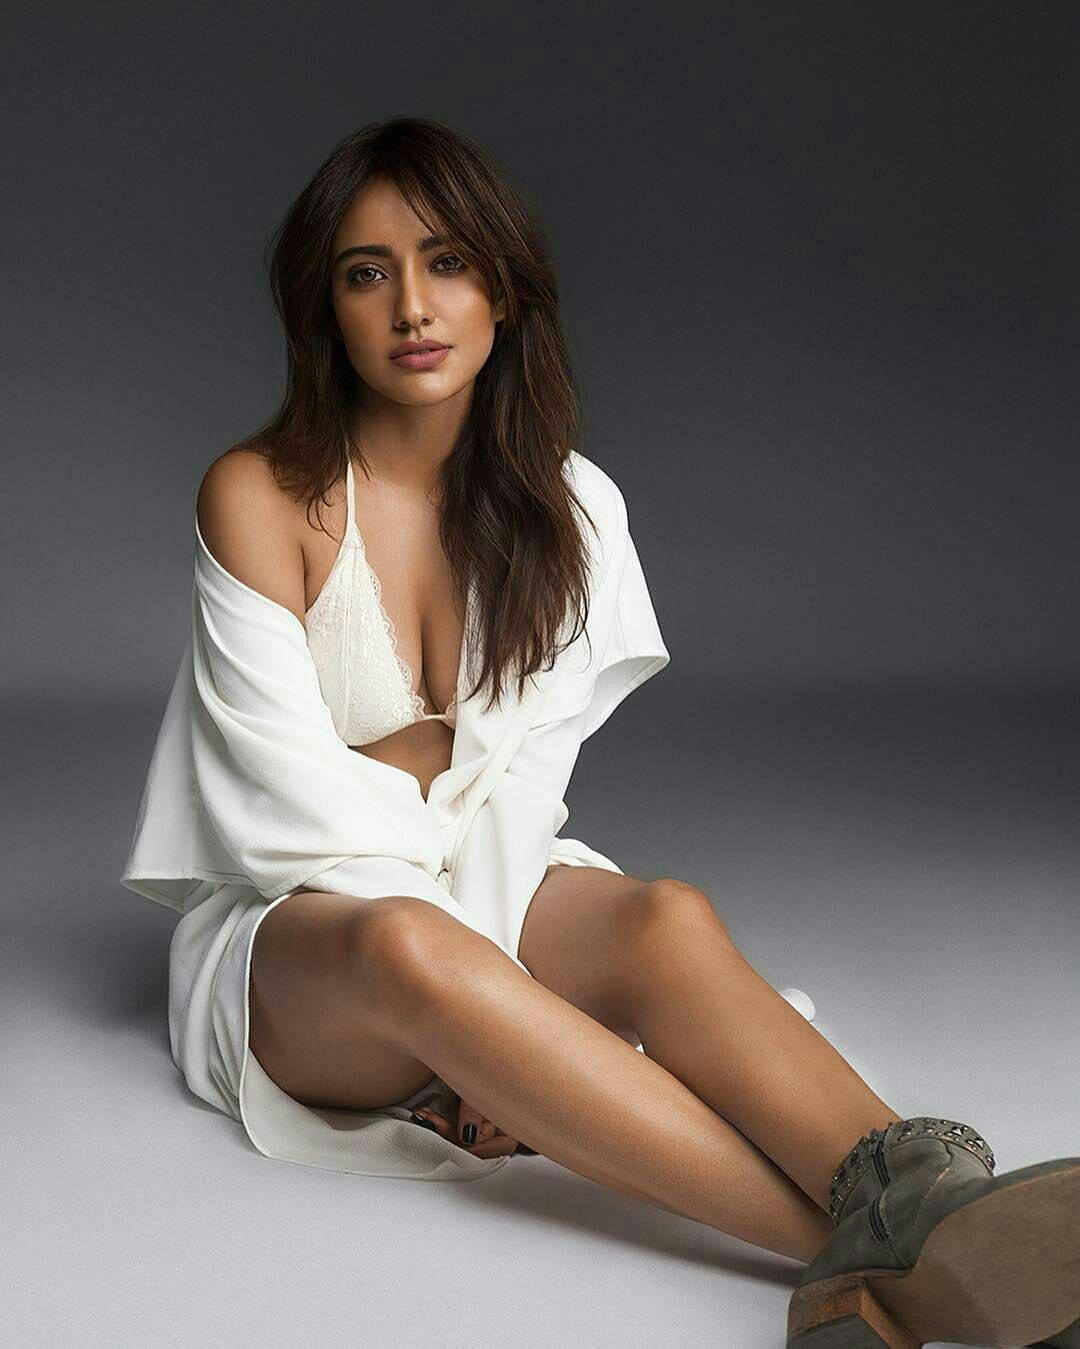 Neha Nehasharma Hot Sexy Cleavage Body Bikini Curvy Indiangirl Girl Bolly Bollywoodactress Bollywood Hindi India Actress Magazine